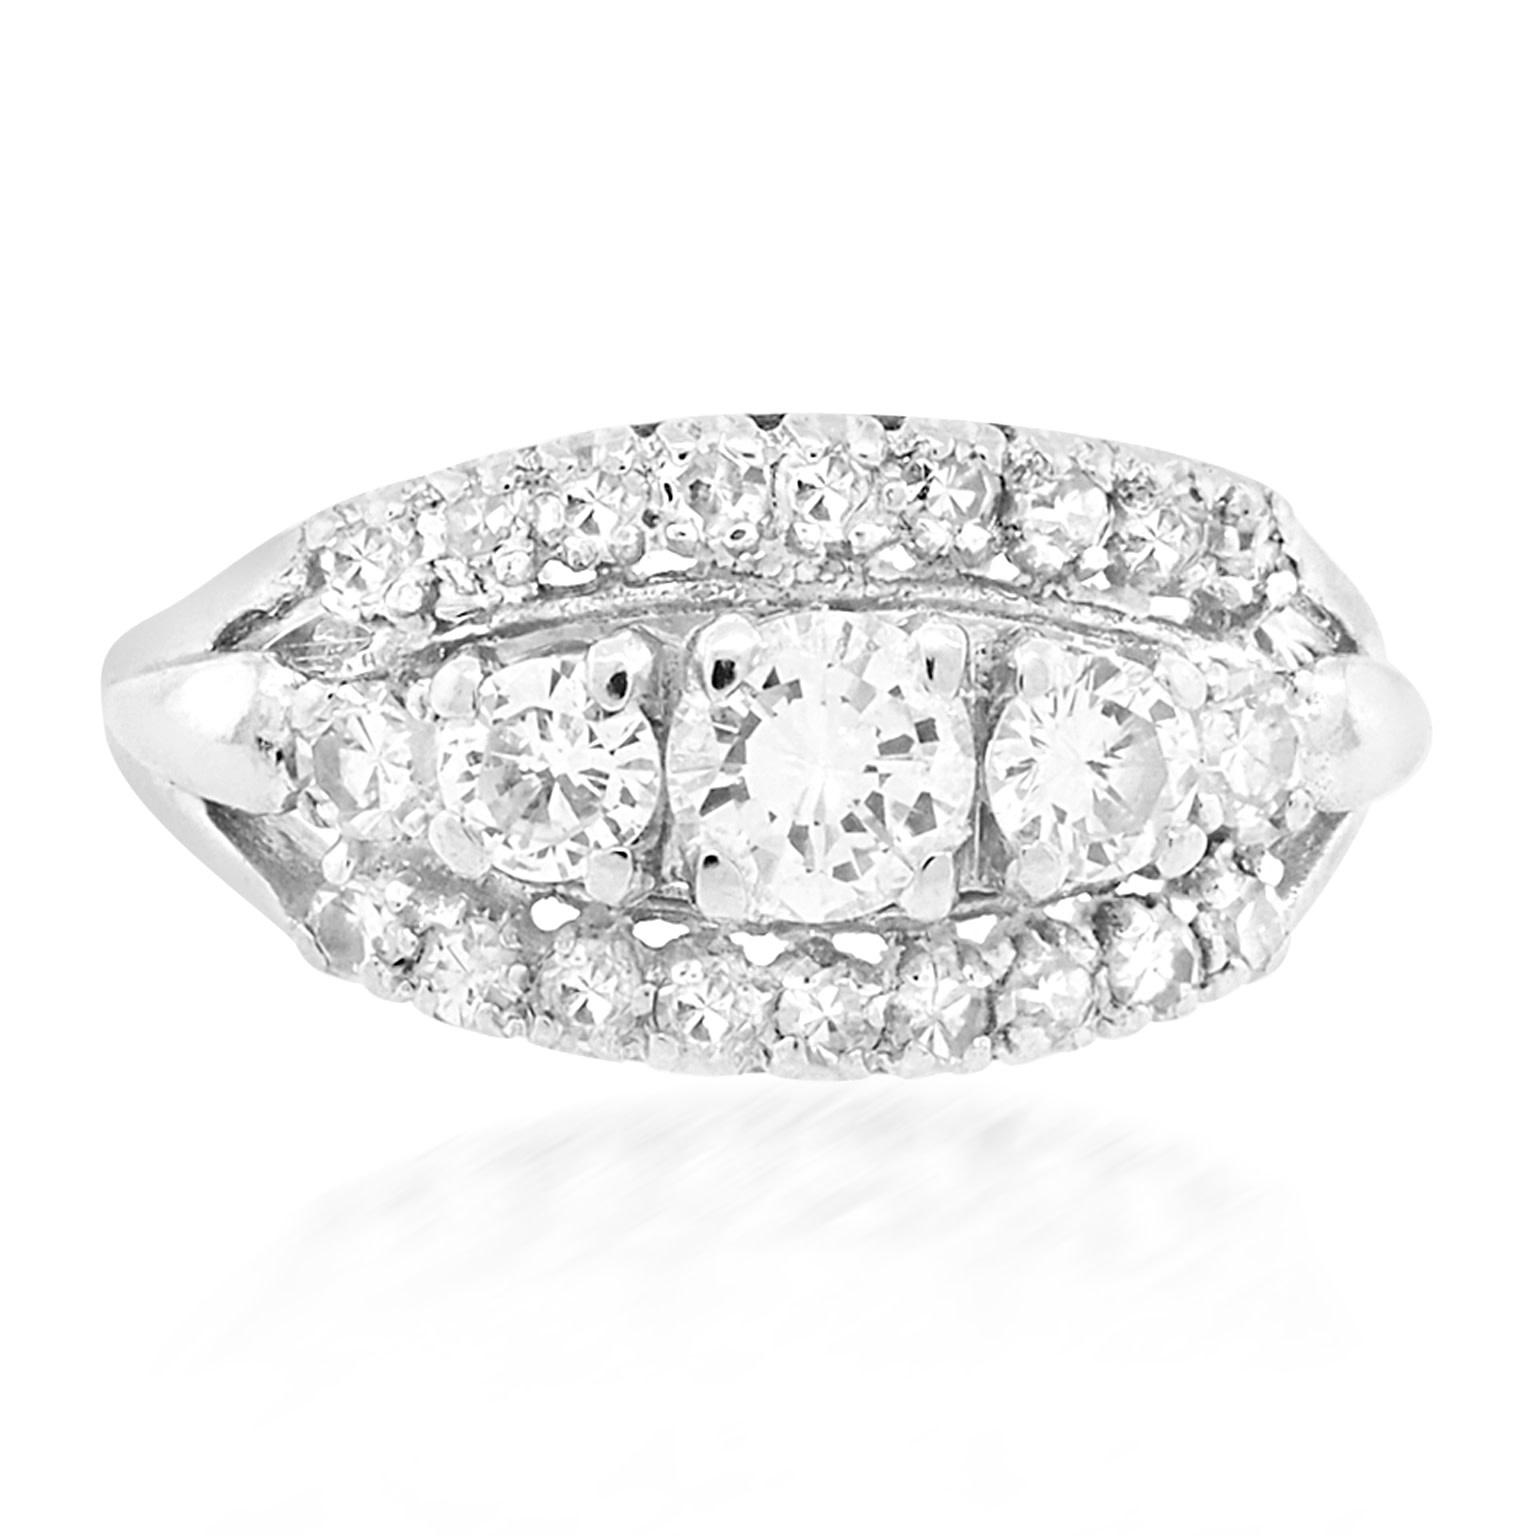 Trabert Goldsmiths Vintage 3-Row Diamond Engagement Ring